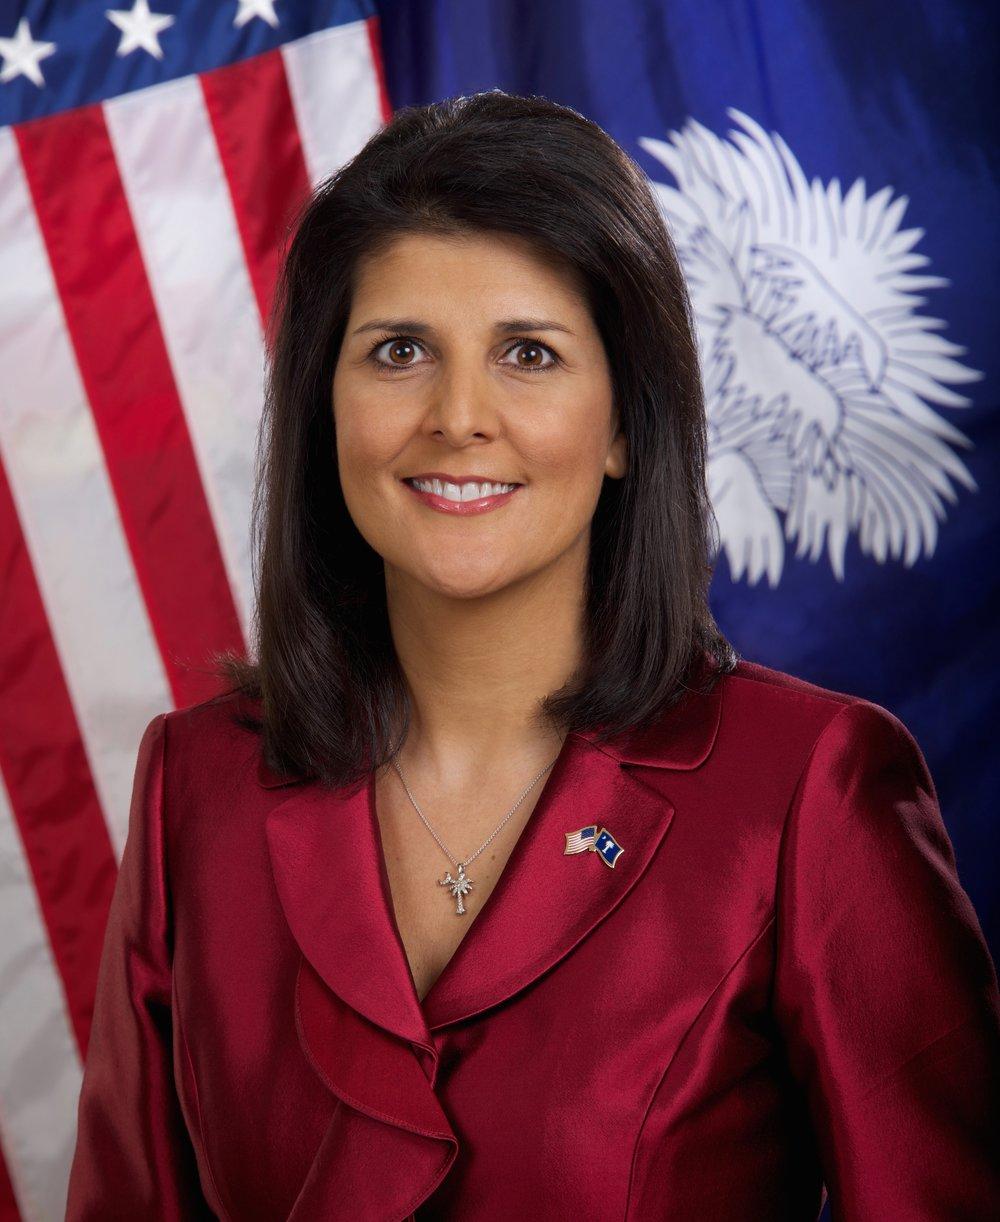 South Carolina Governor Nikki Haley. Credit: South Carolina Governor's Office/Sam Holland.